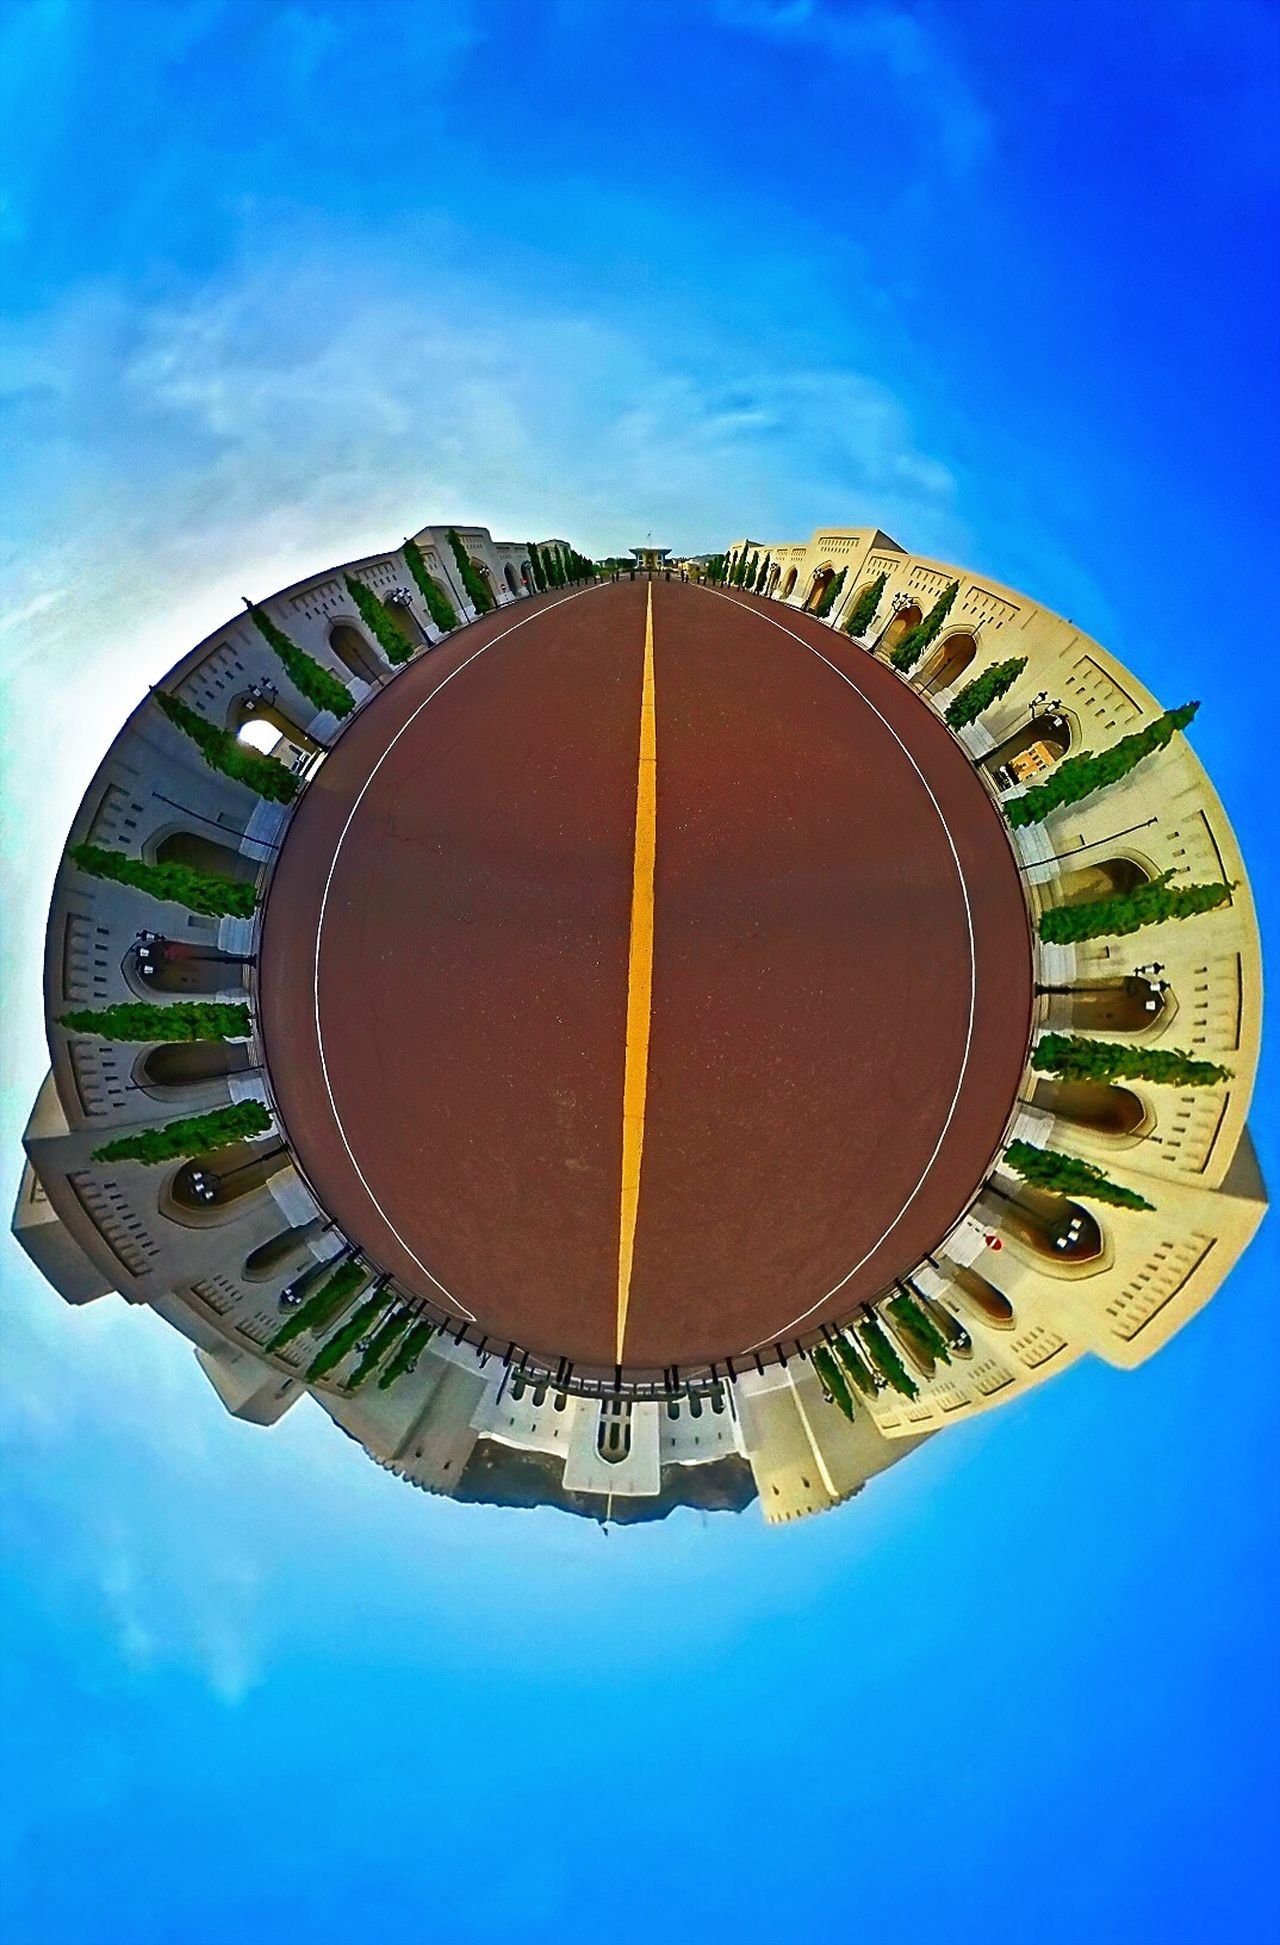 Tiny Planets 360 Panorama 360camera 360° Panoramic Views Blues & Greens Blue Sky Alternative View Samsung Gear 360 Muscat, Oman Beautiful Architecture Royal Palace Visit Oman